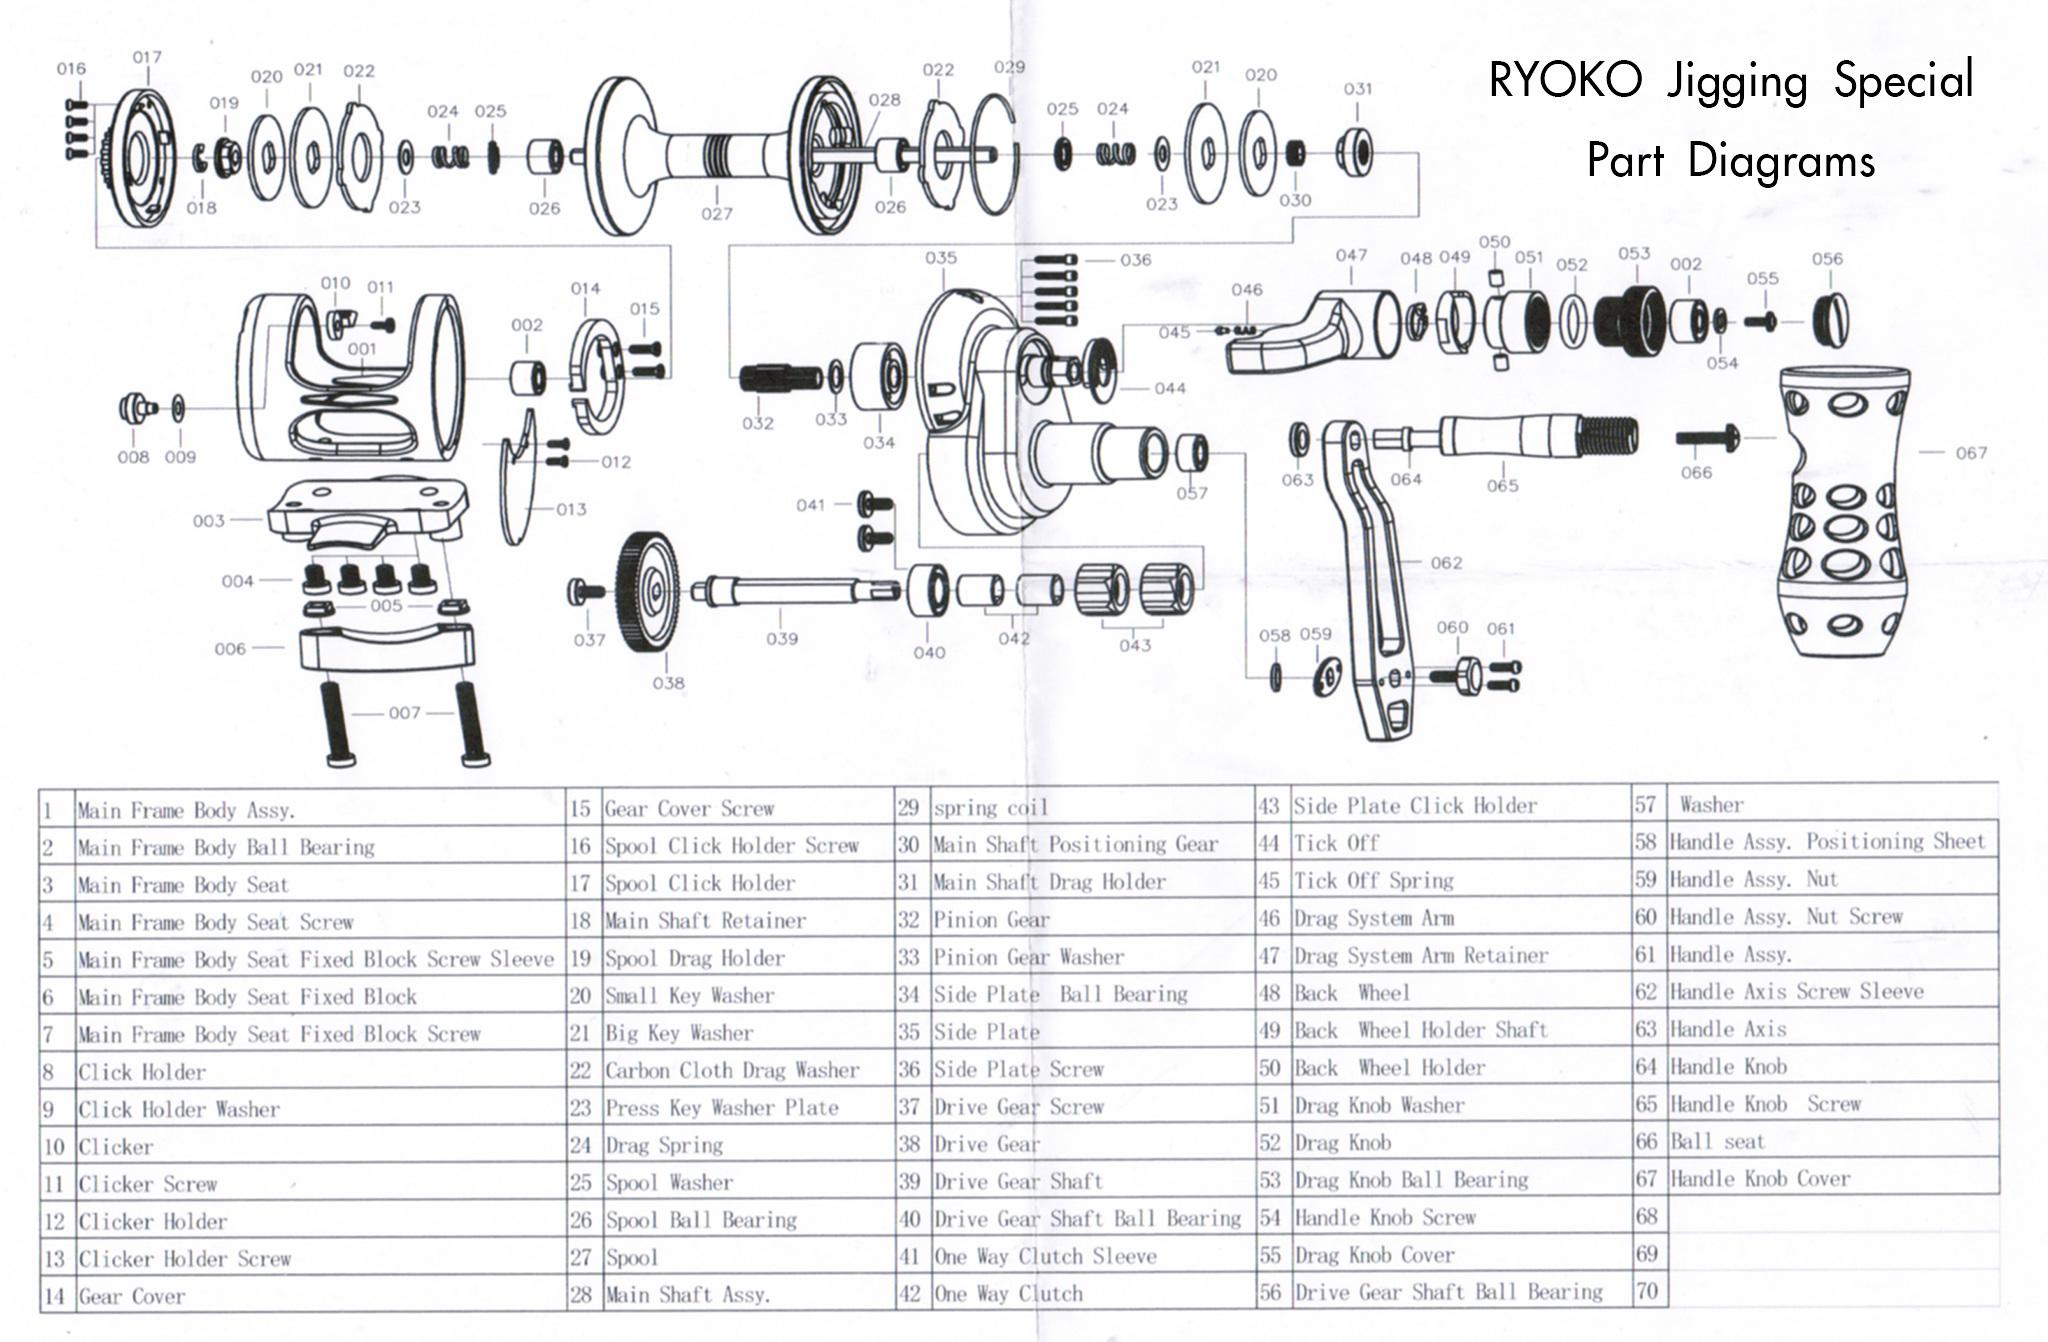 RYOKO Jigging Special 100/200/300